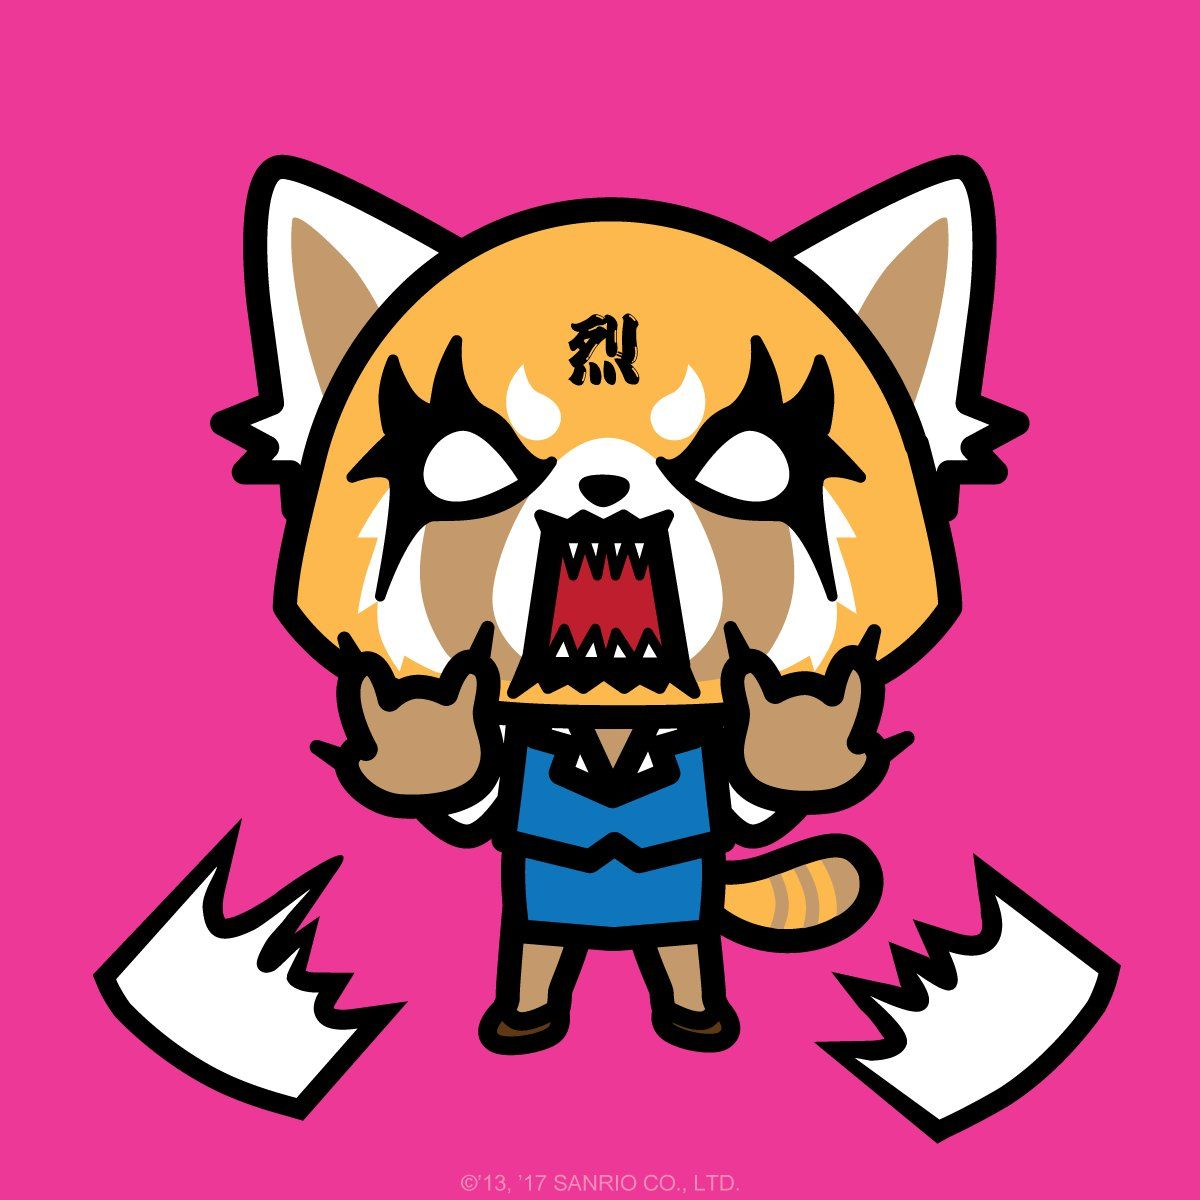 Sanrio's newest character Aggretsuko! She's a 25yearold